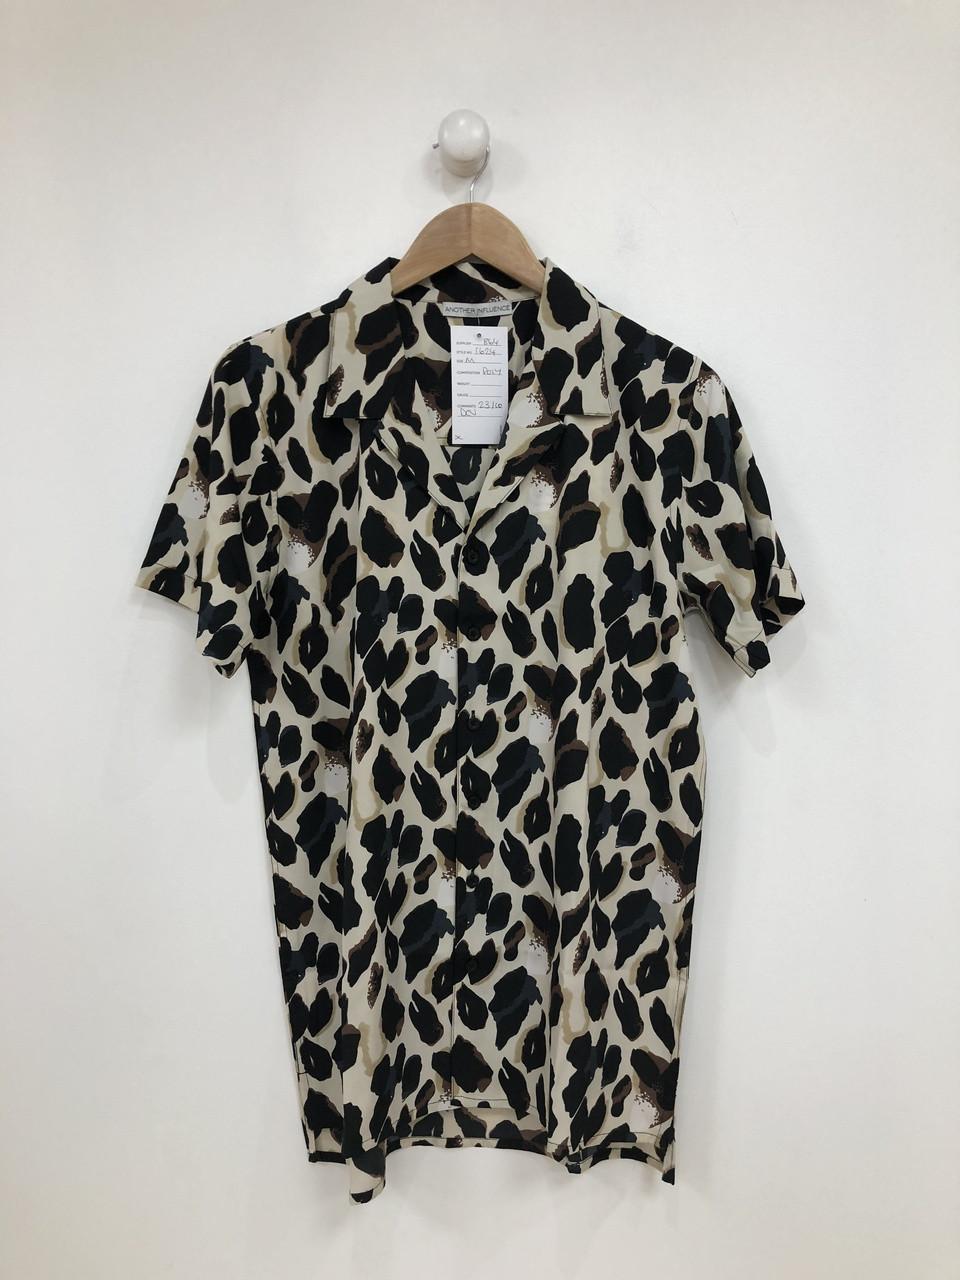 Leopard Print Short Sleeves Shirt